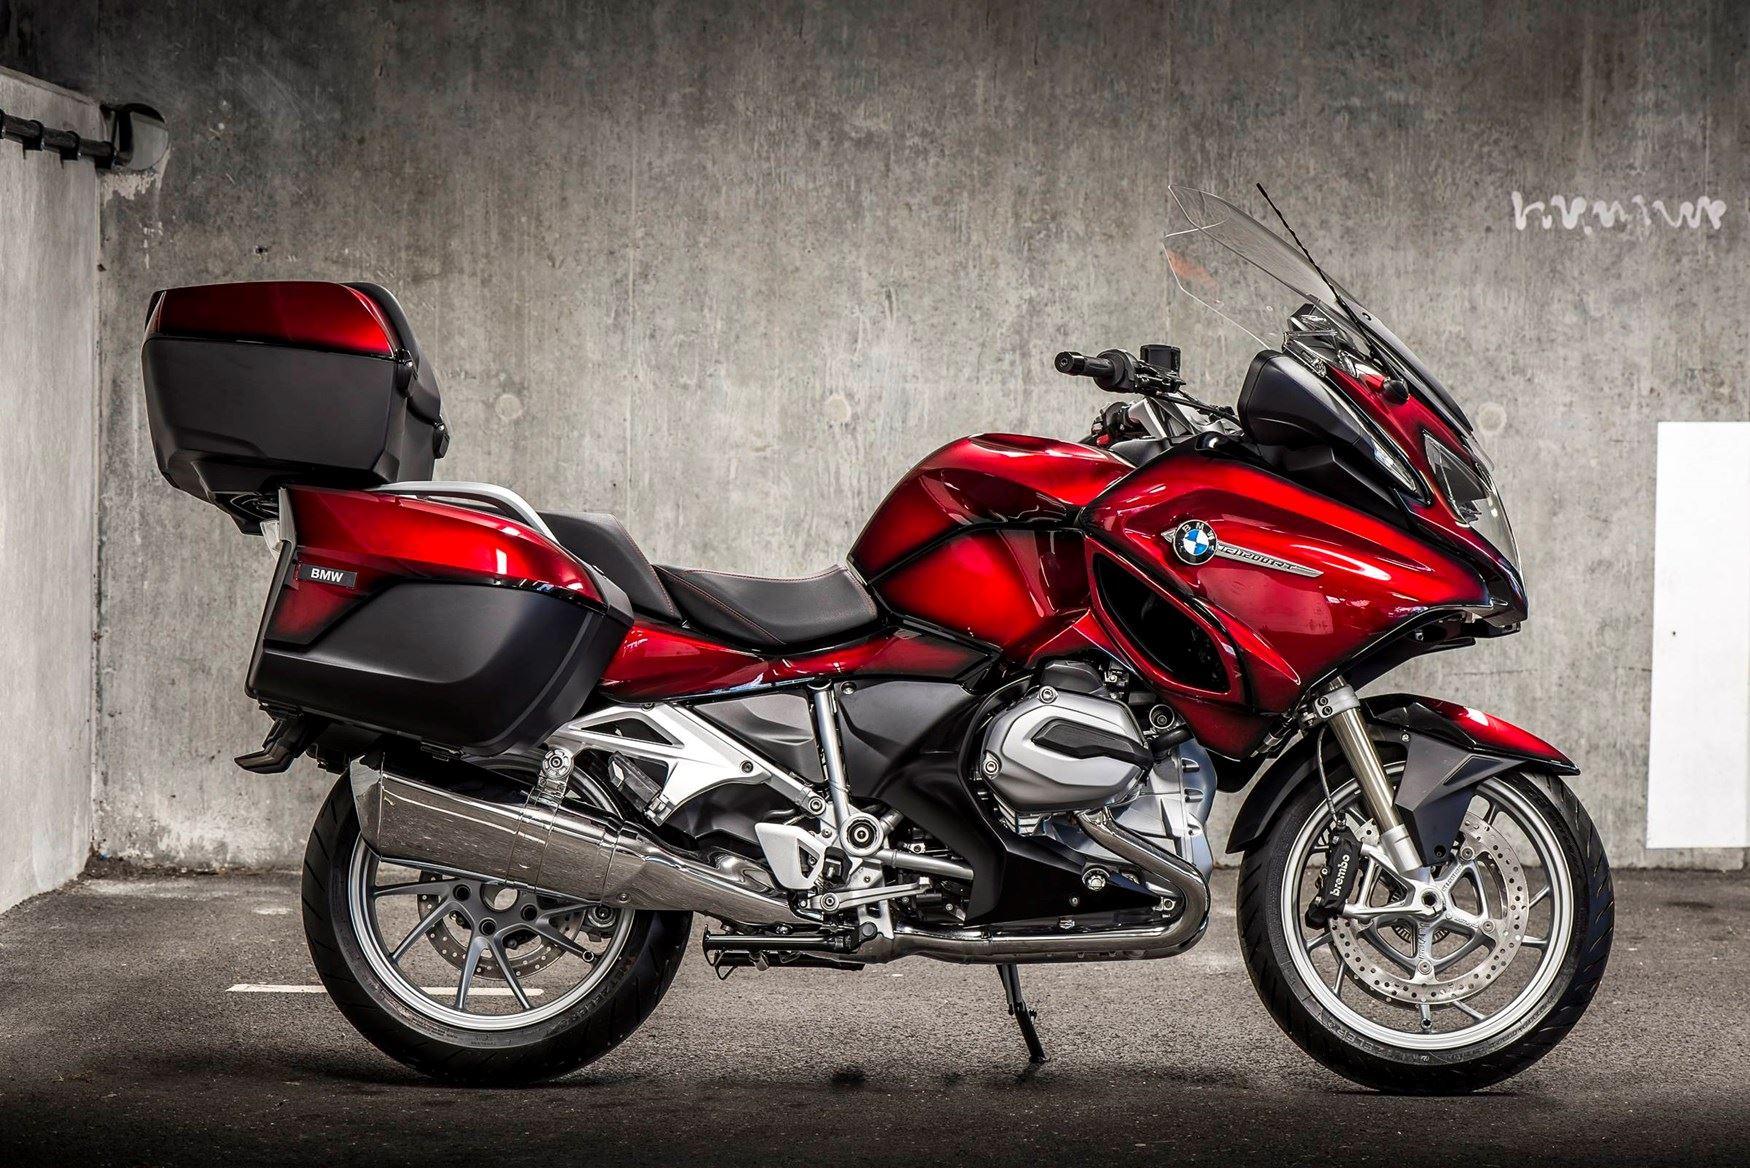 Bmw Iconic 100 Motonews Andar De Moto